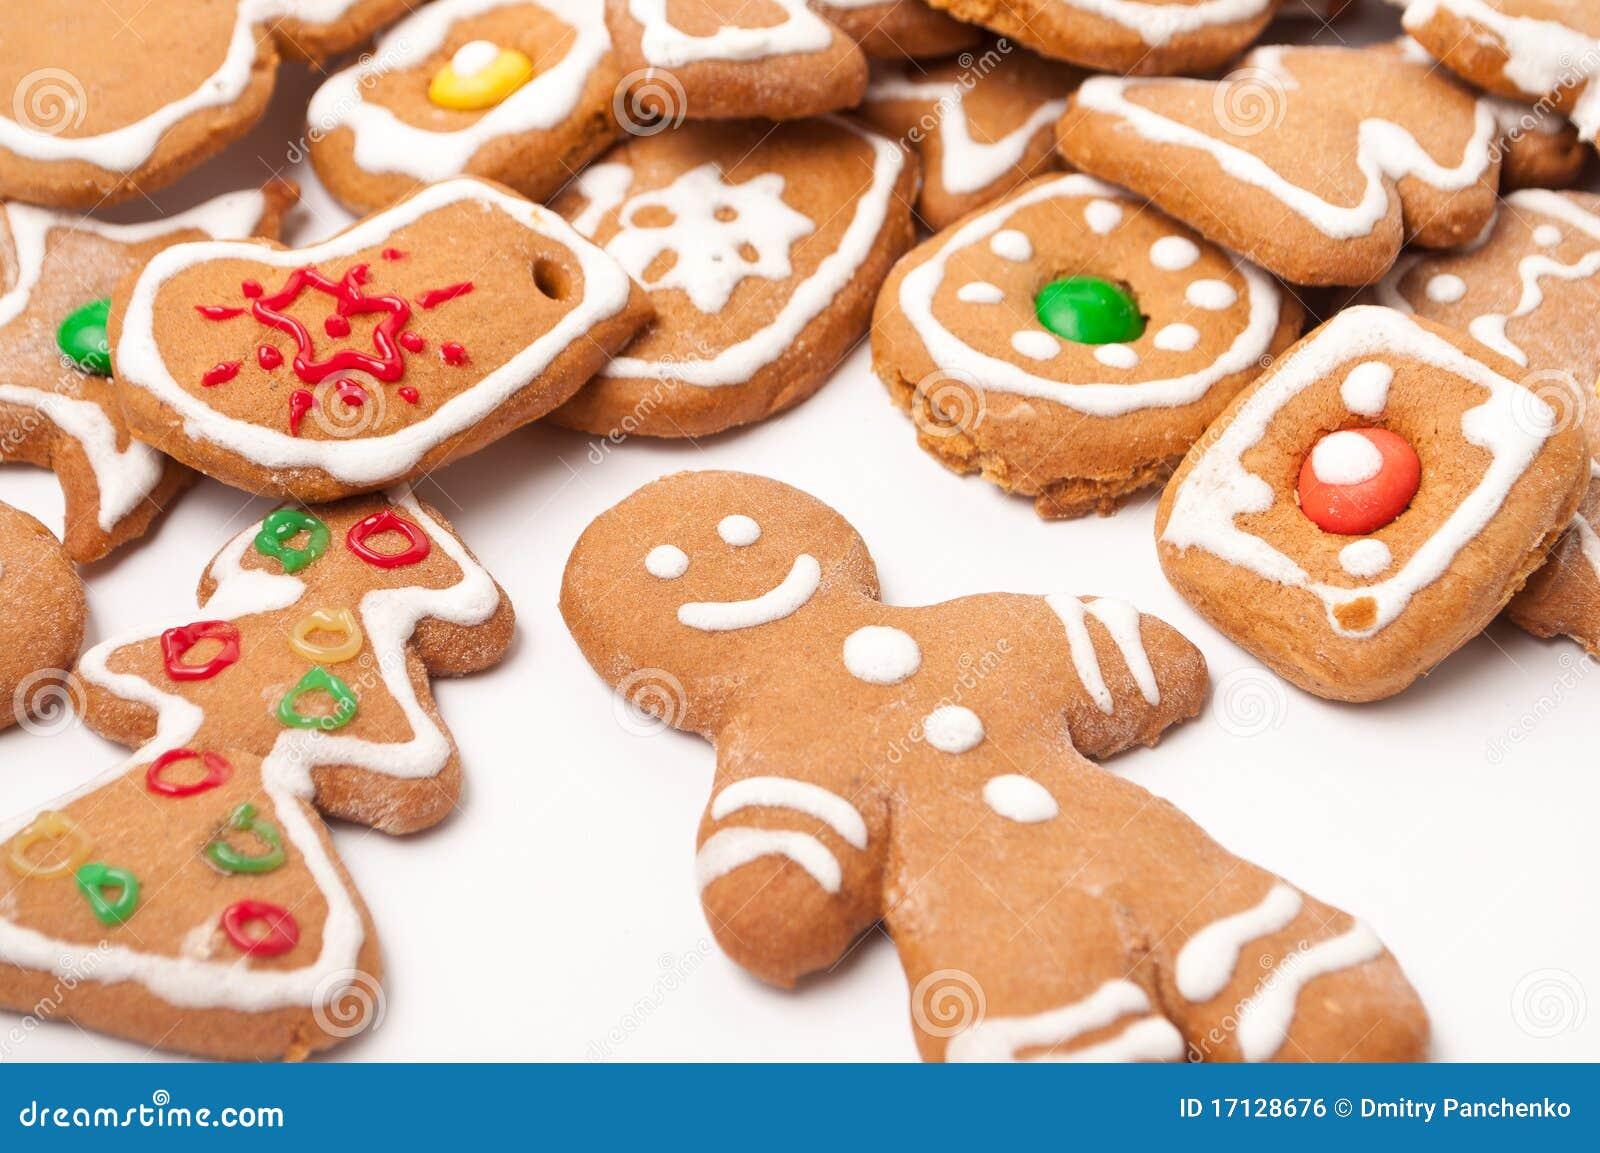 Homemade Christmas Cookies Royalty Free Stock Image   Image  17128676 OKHHAp7M